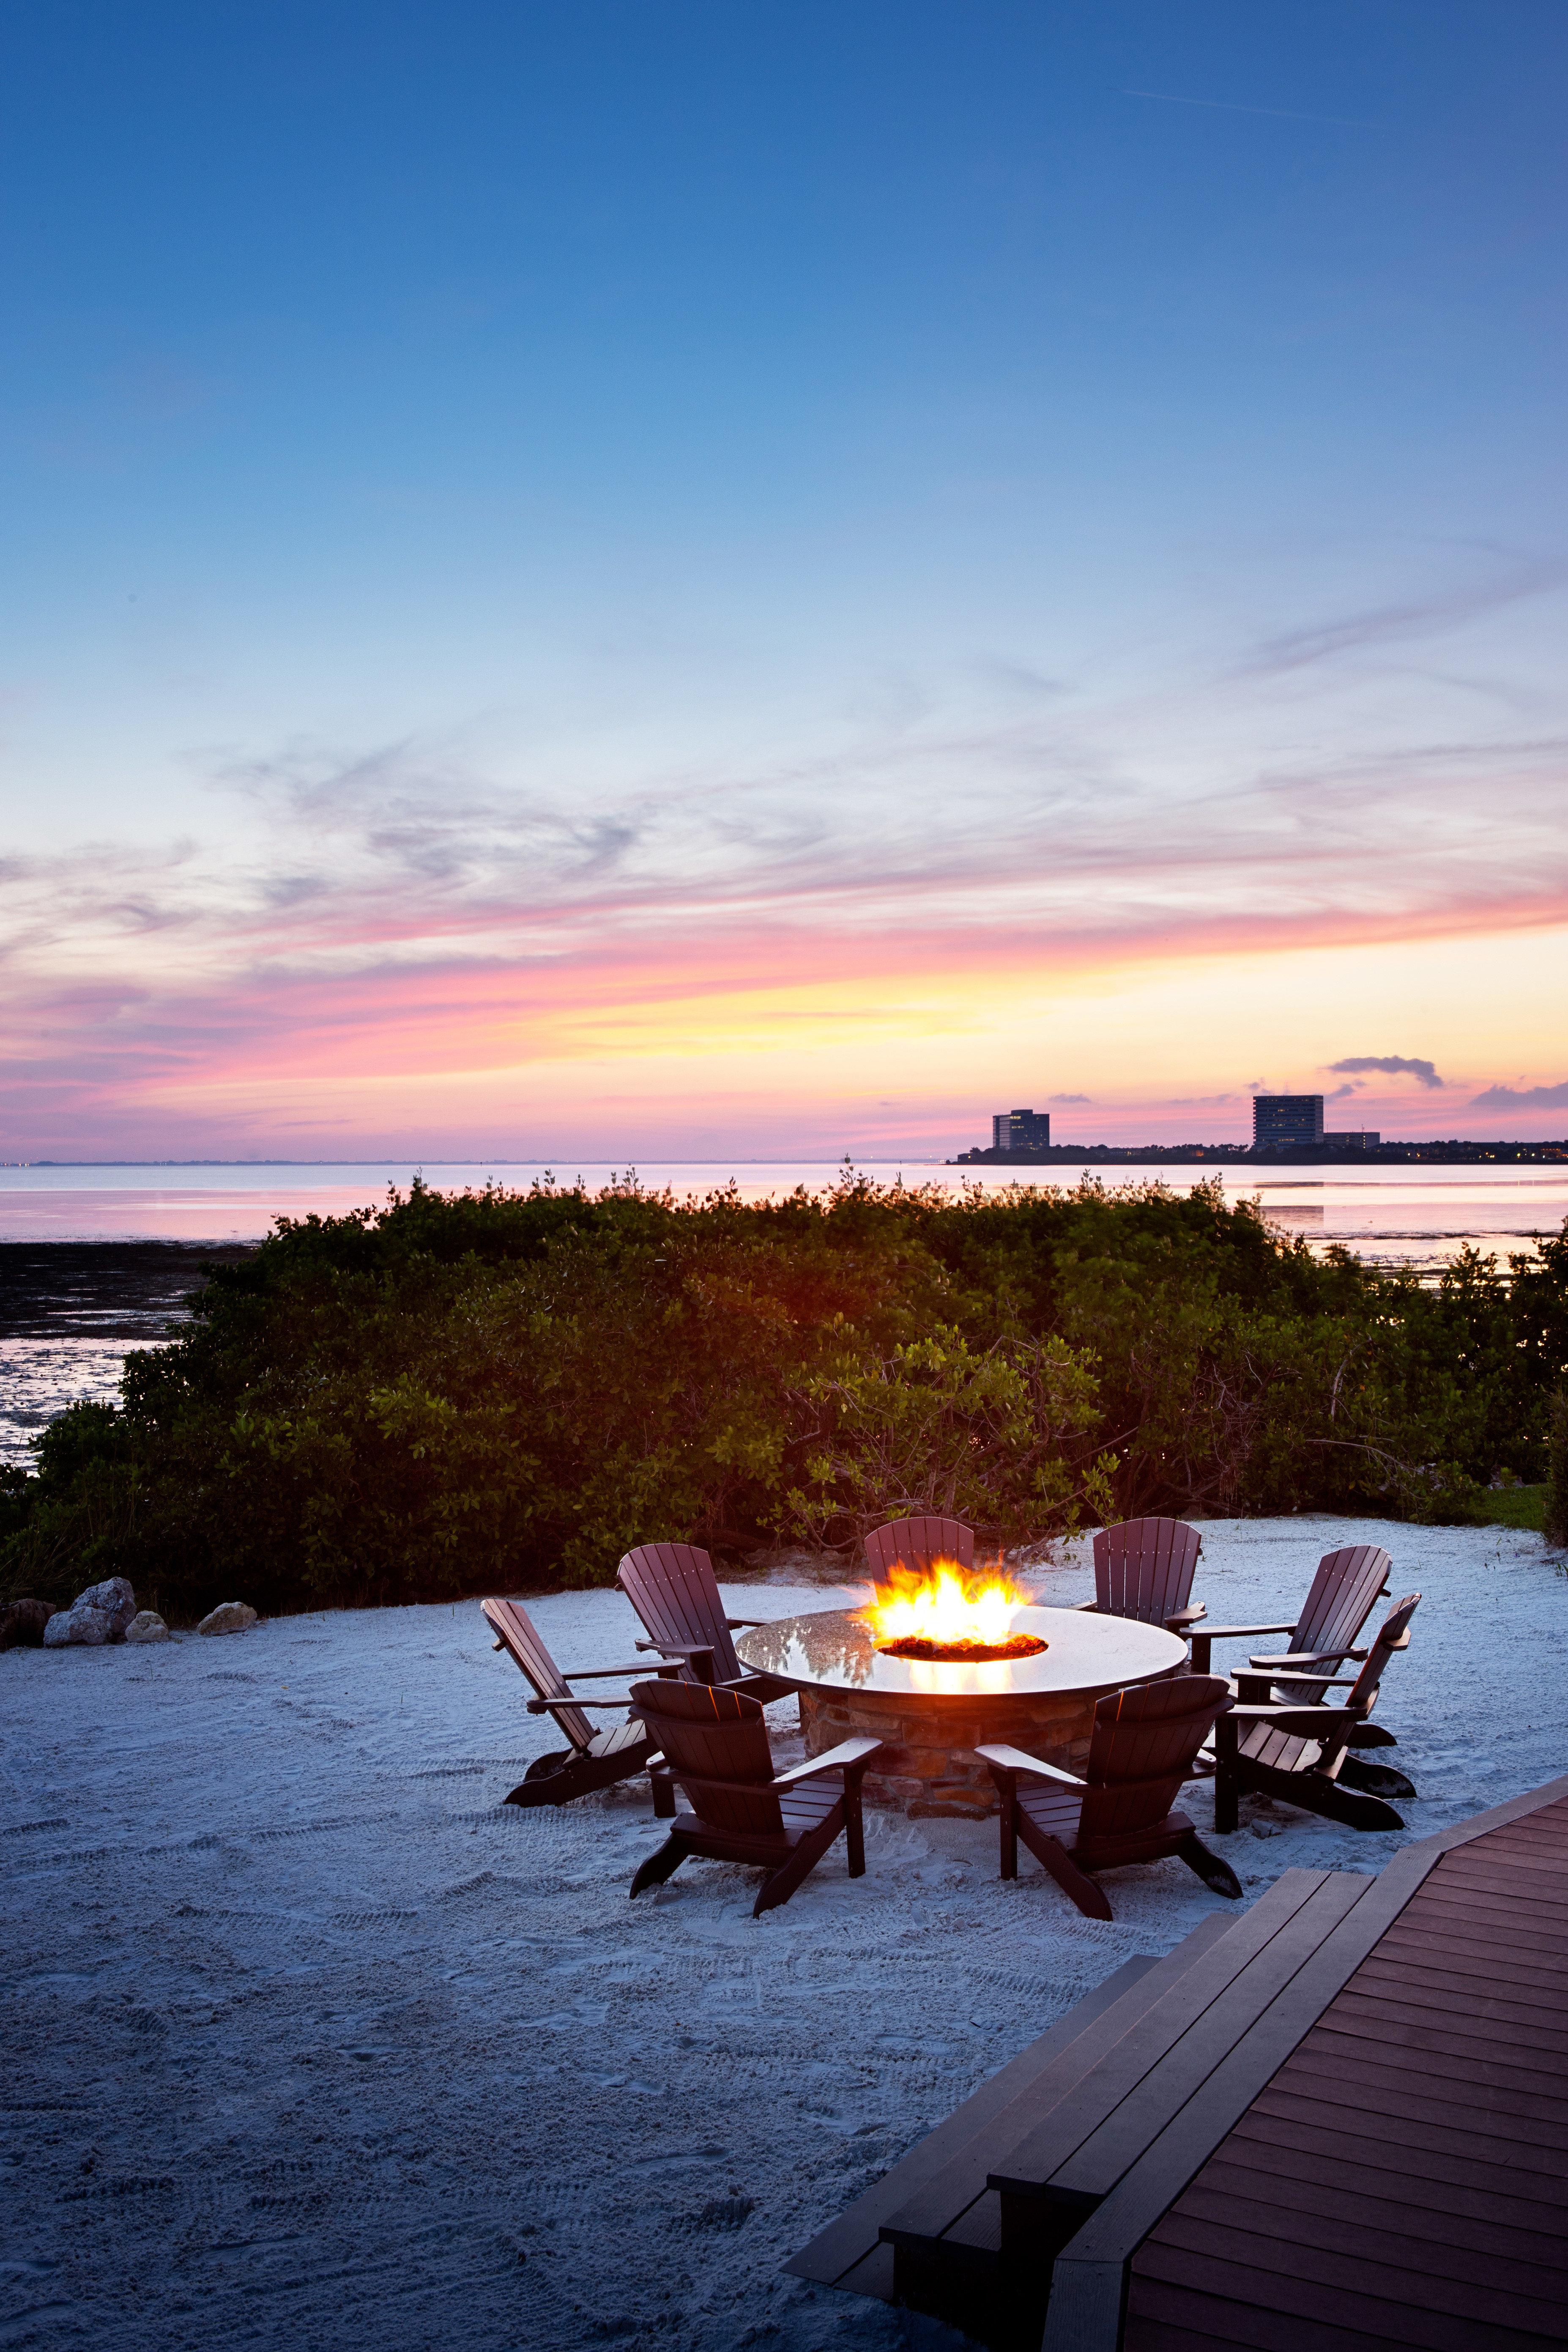 Beach Firepit Lounge Luxury Sunset sky water horizon sunrise Sea dawn Ocean morning shore dusk evening cloud sunlight Coast Nature